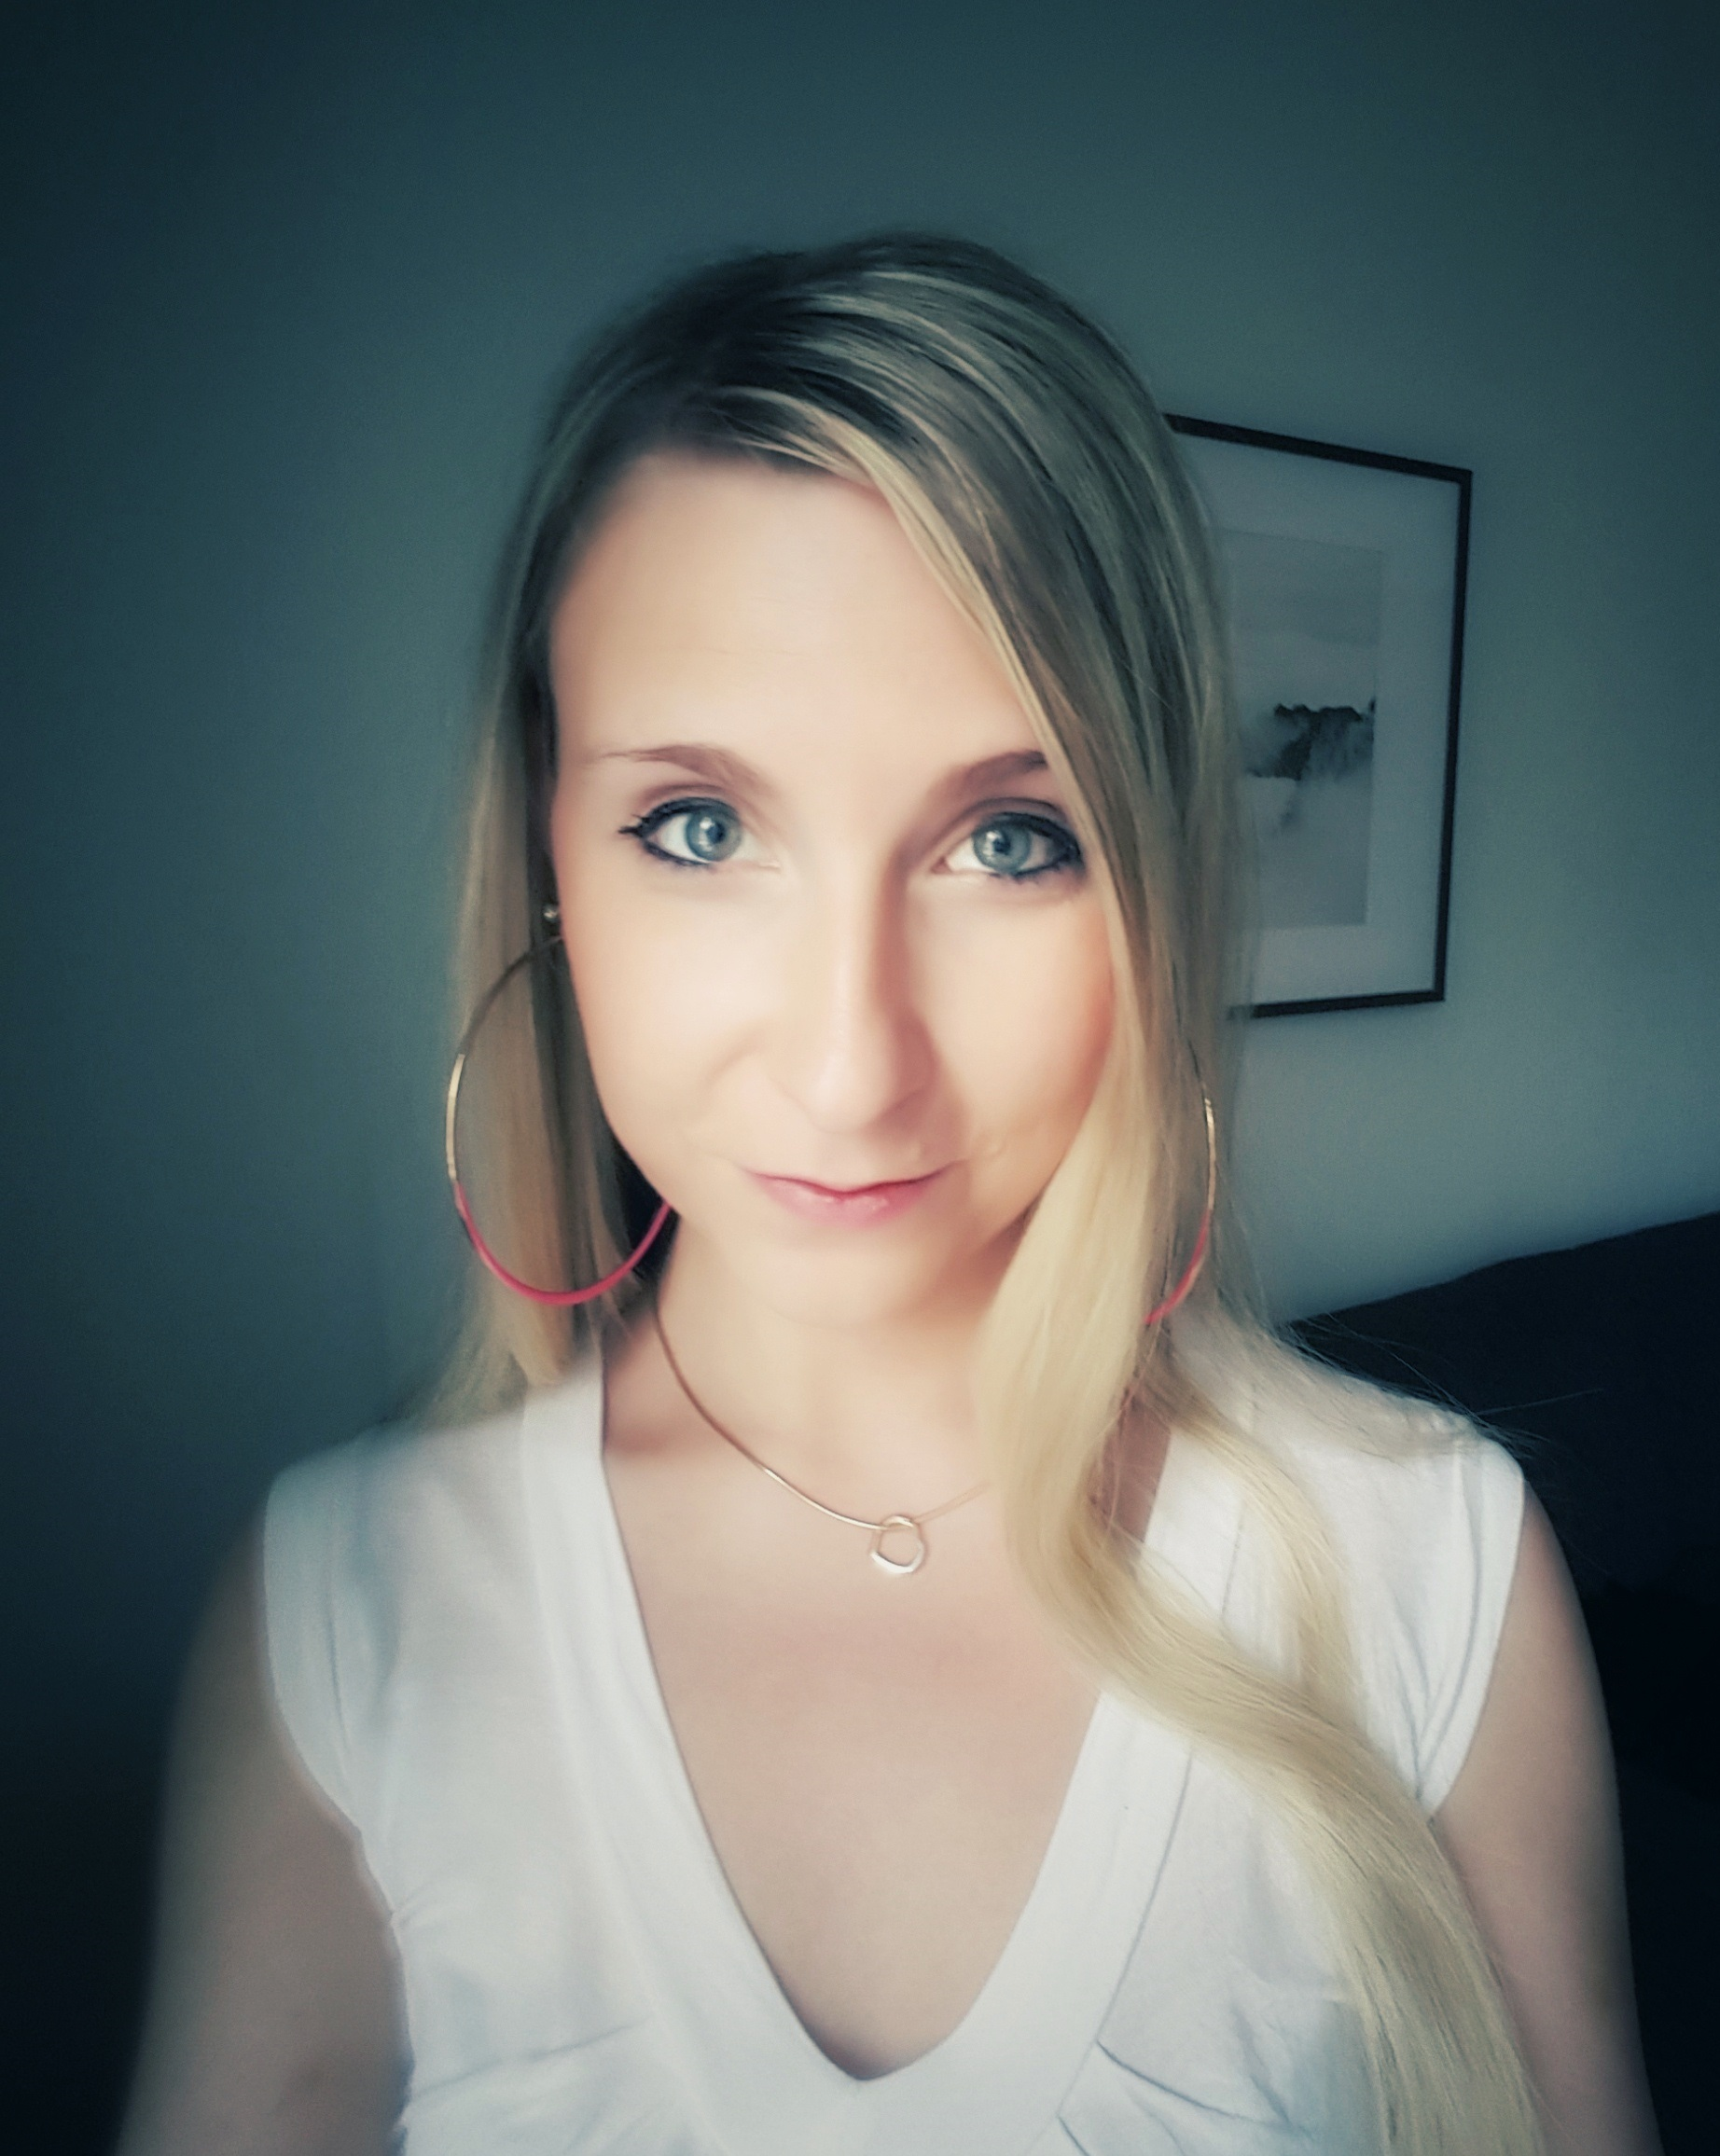 Outlandish blog blogger what motivates me